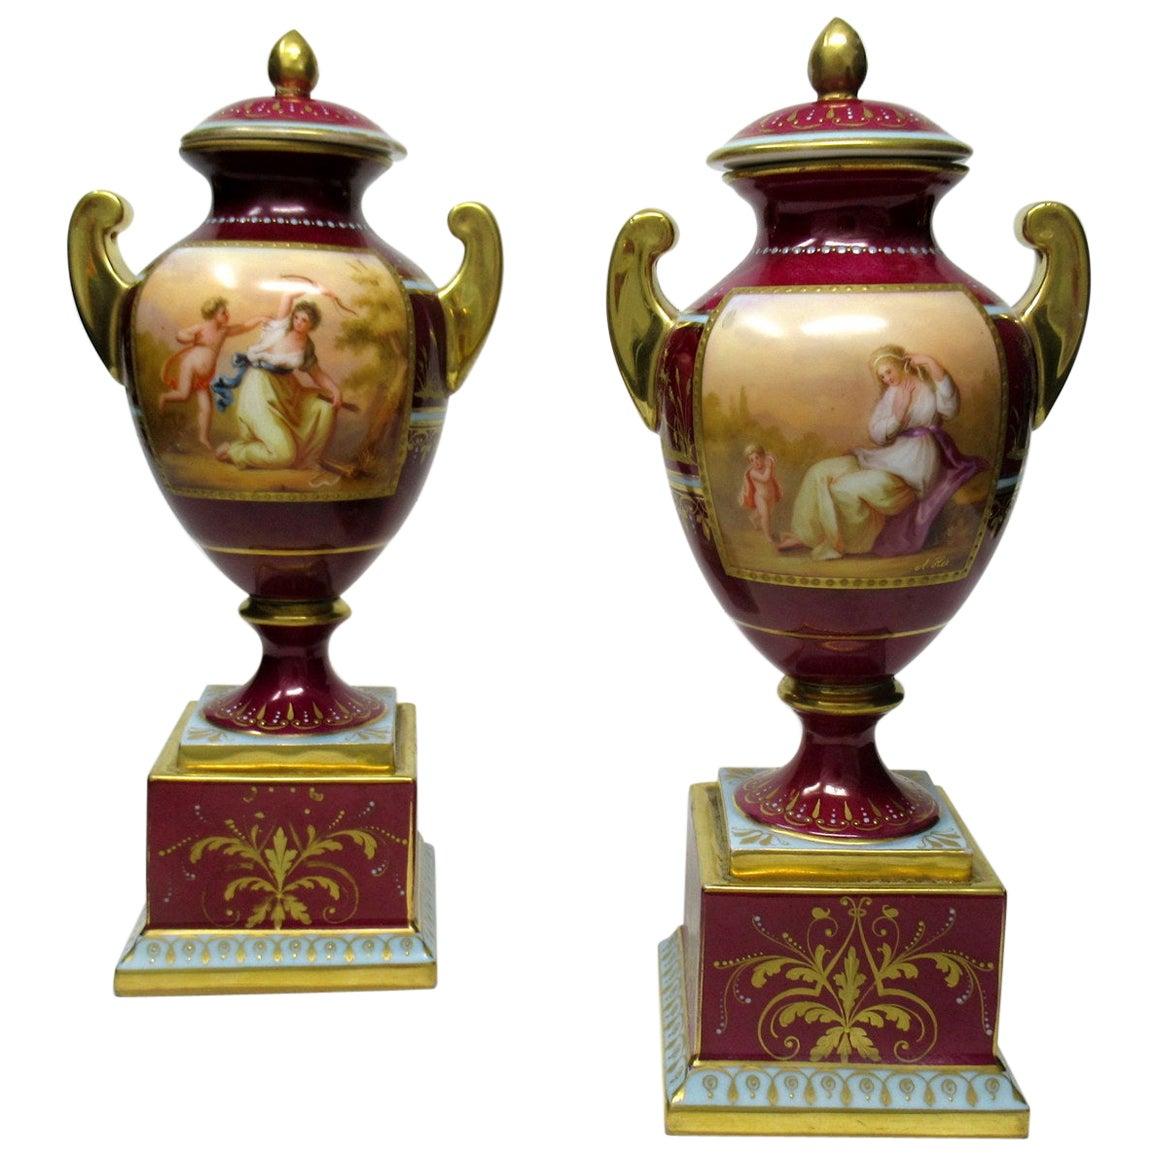 Fine Pair of Austrian Royal Vienna Mythological Themed Hand Painted Vases